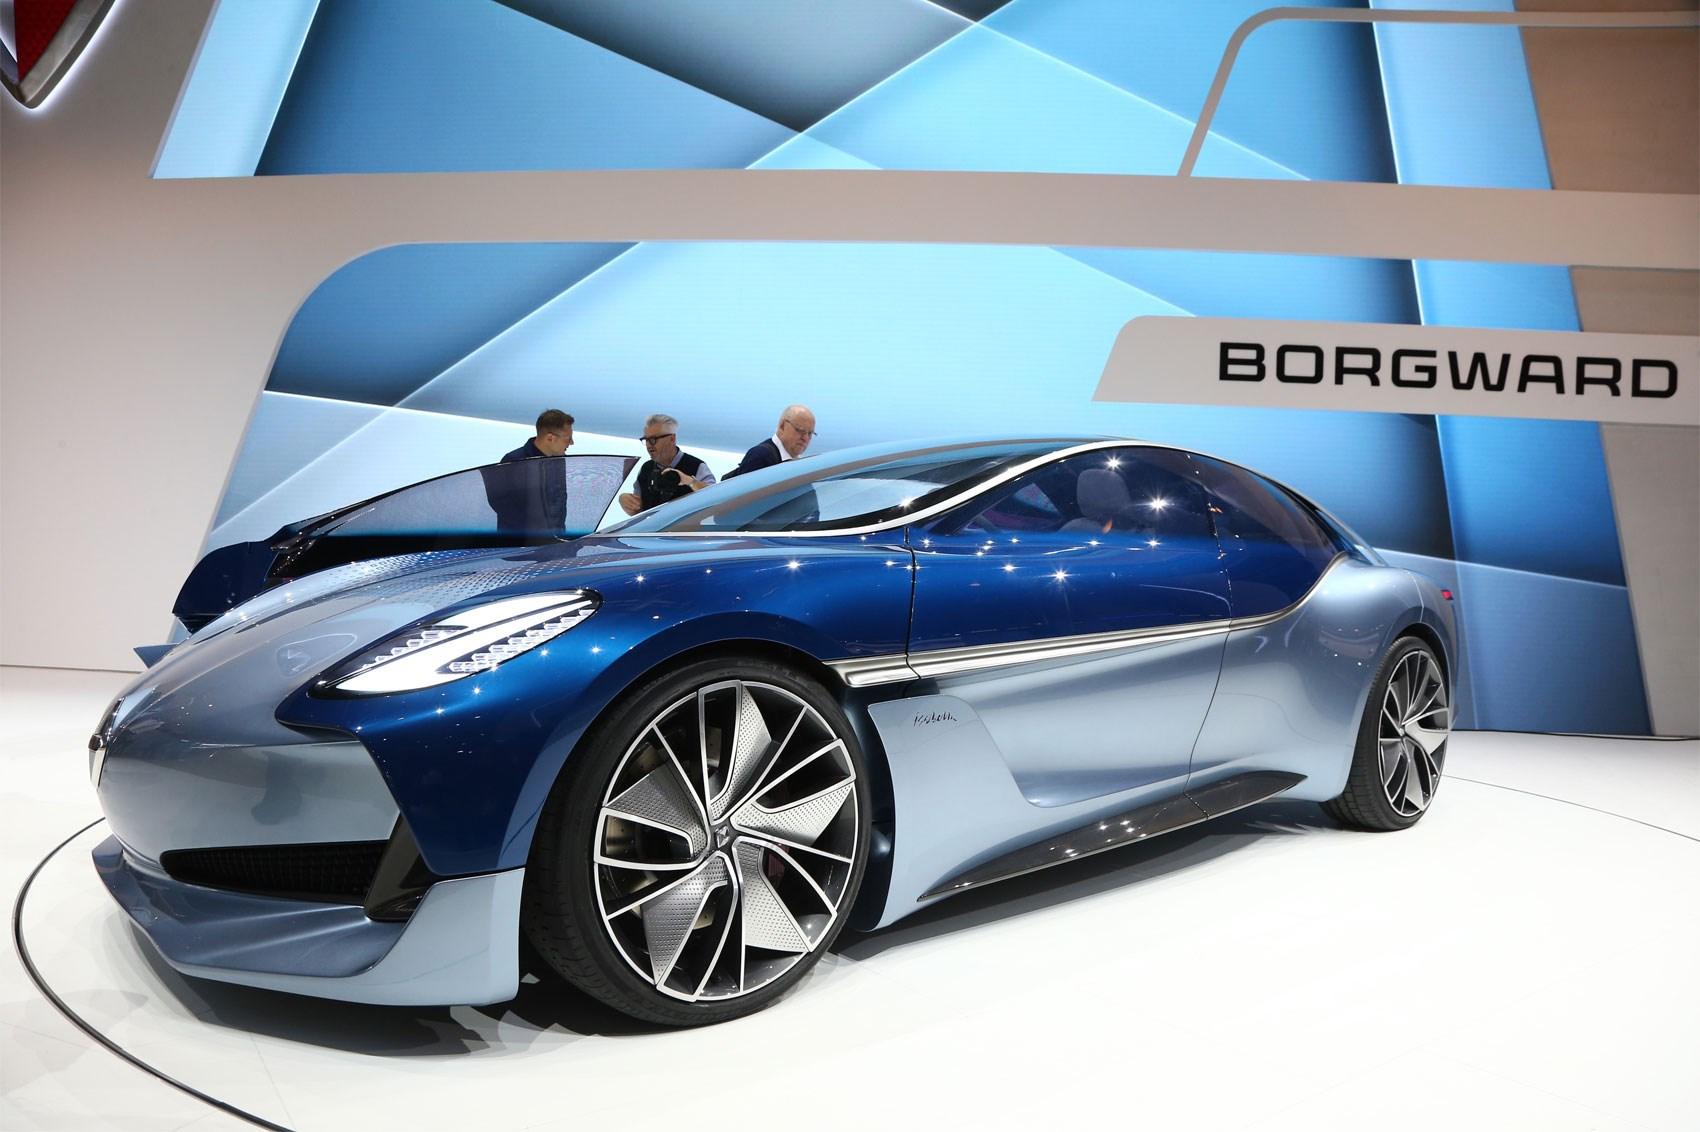 Borgward Isabella: Sports Car Concept, Electric SUV